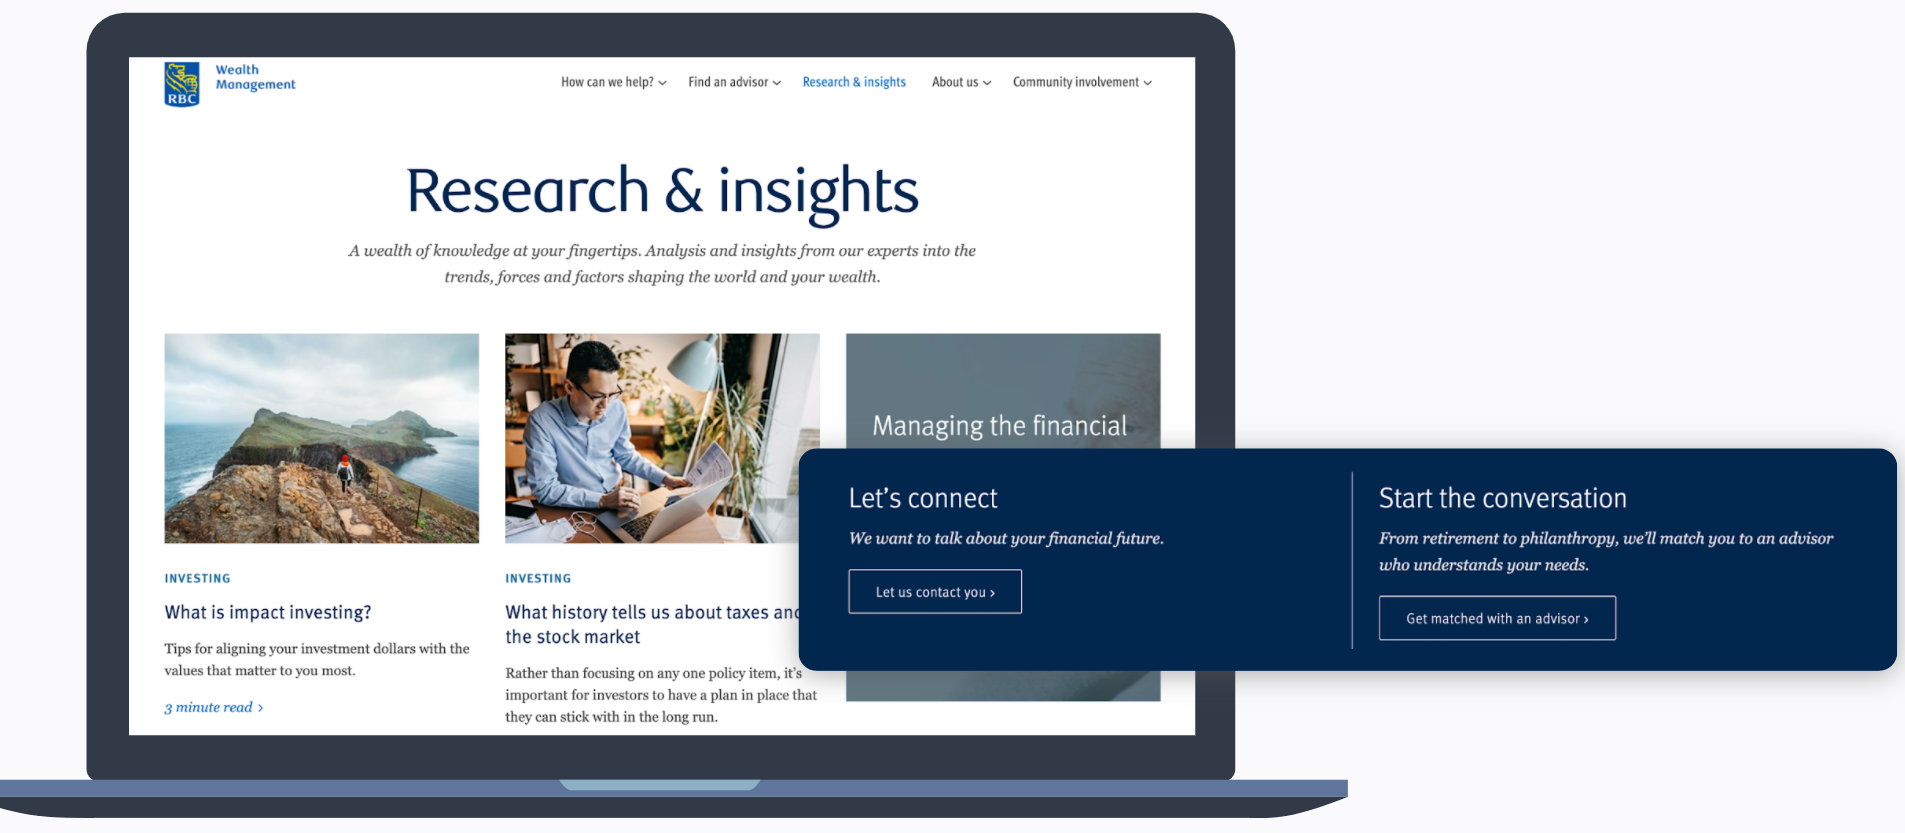 RBC Linkedin - Research & Insights